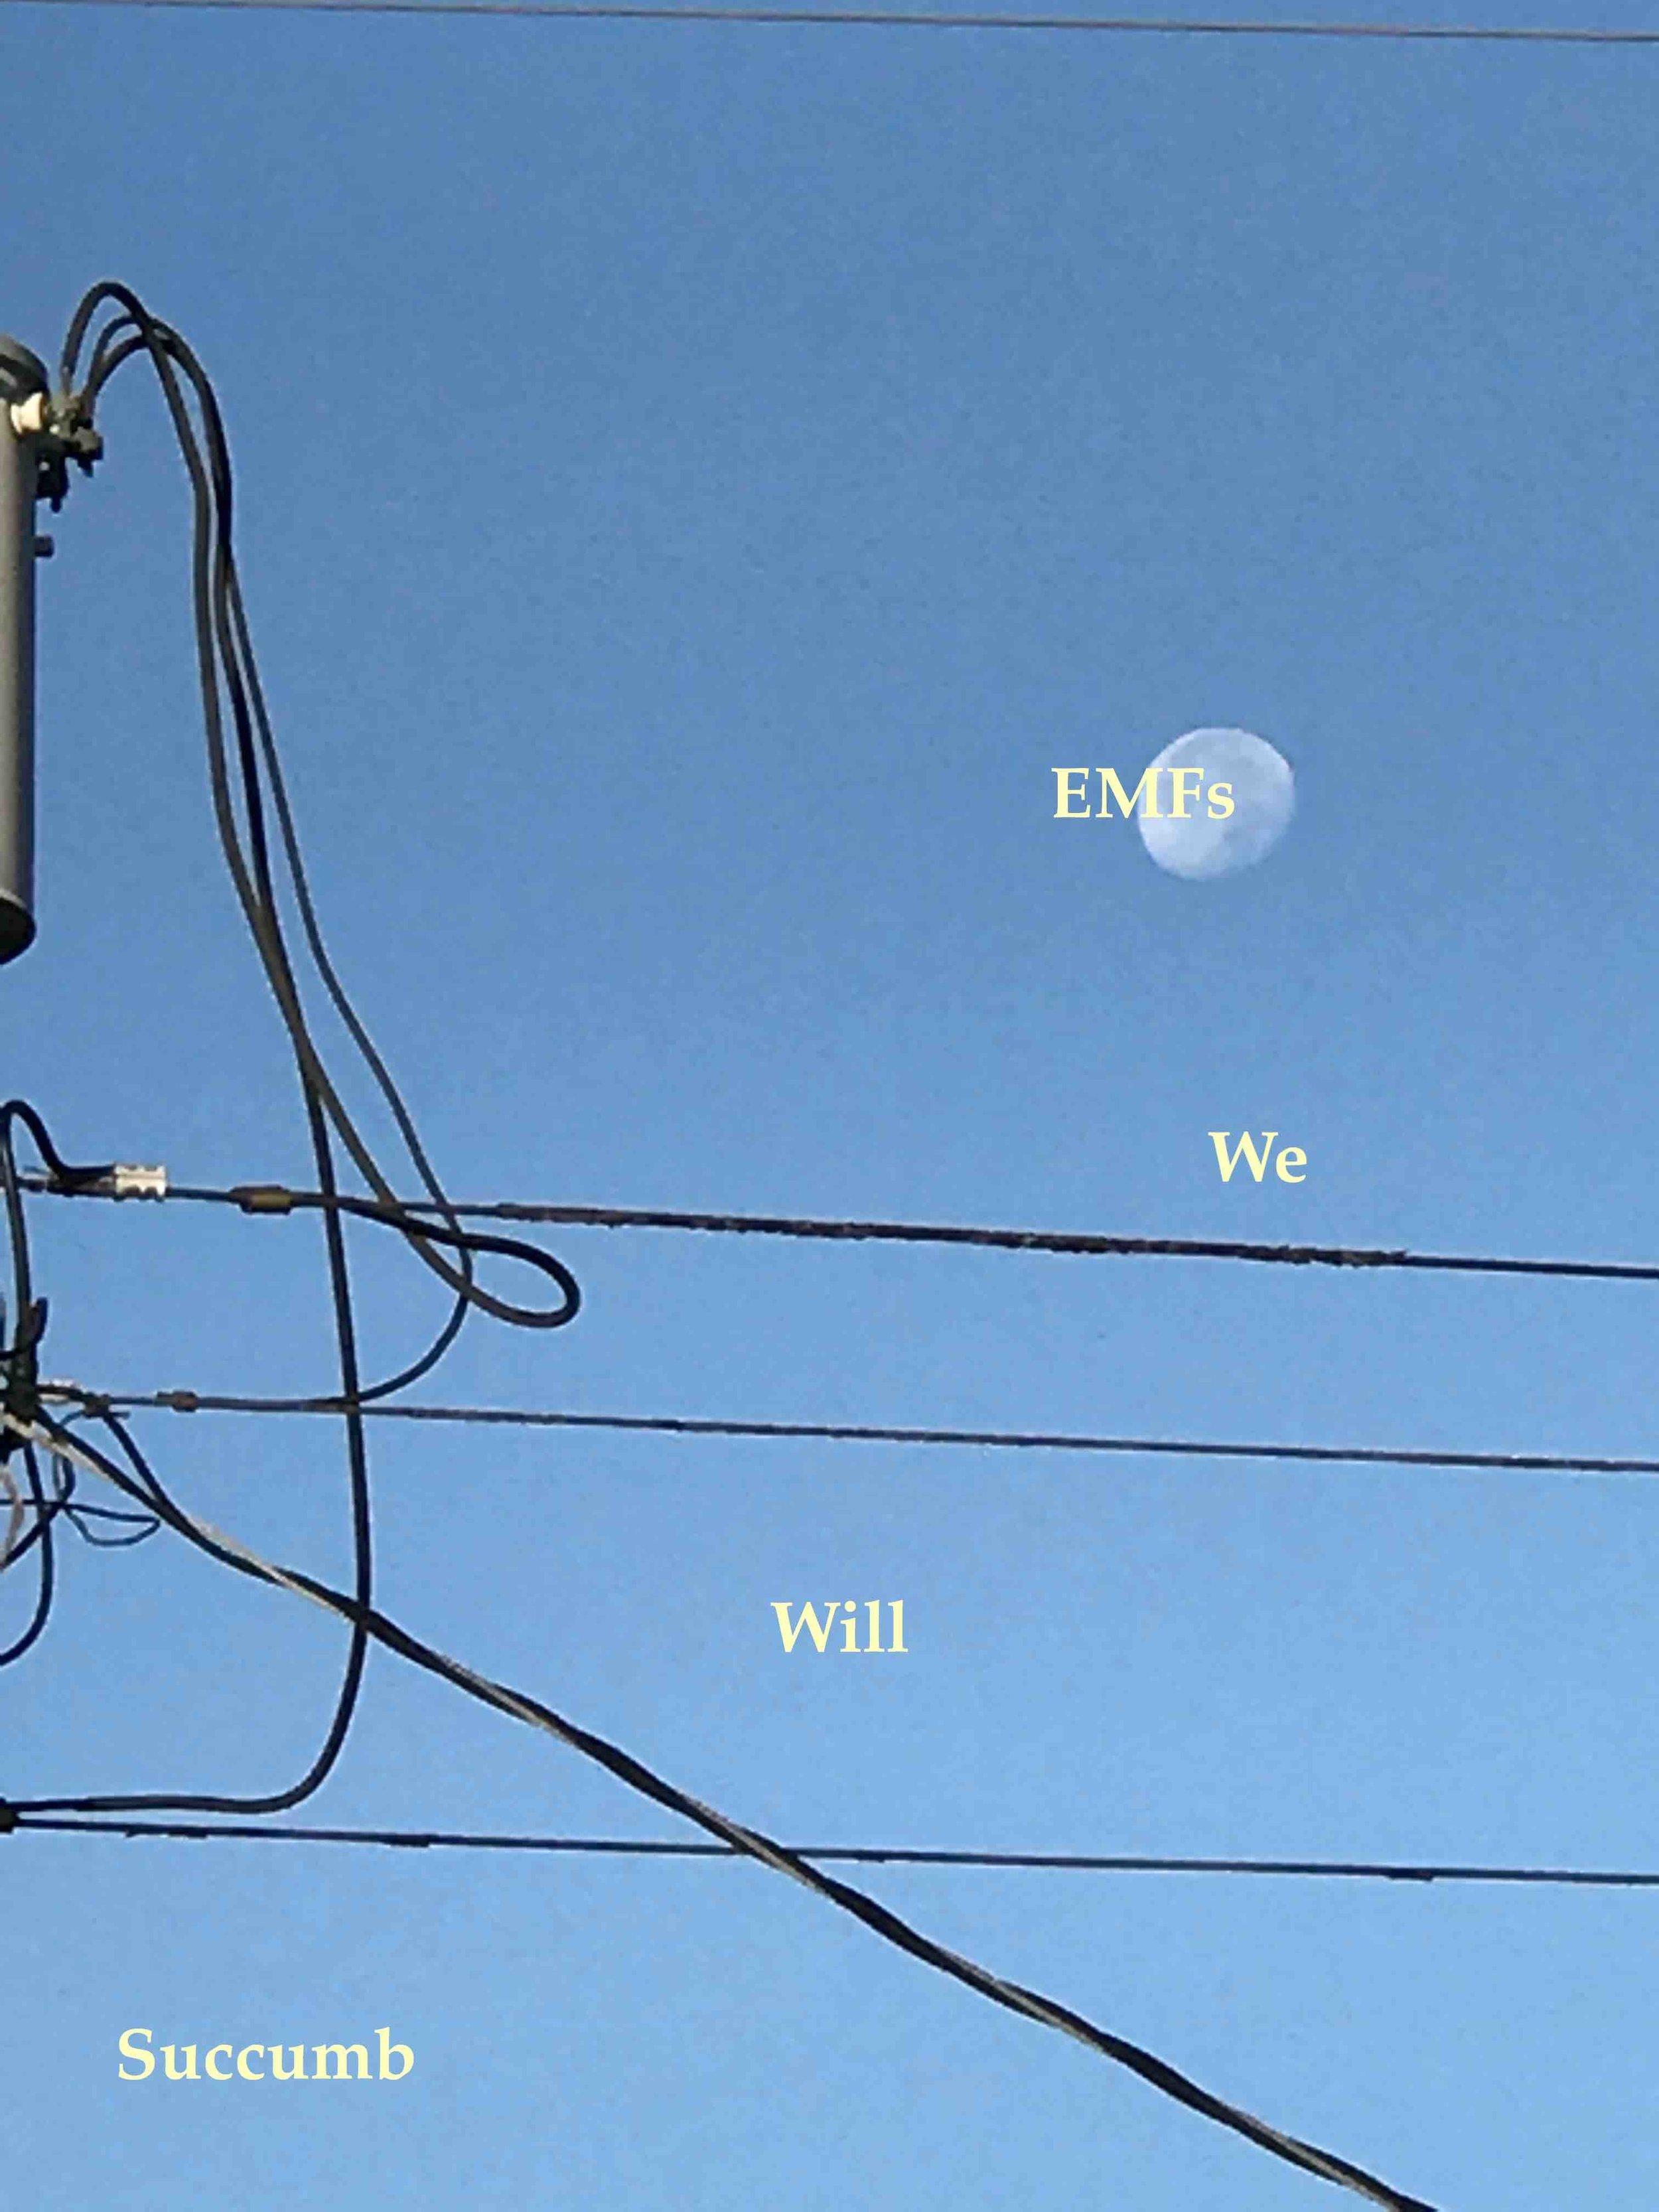 EMFs (we will succumb)  Digital Assembly, October, 2016 Copyright © Tennyson Woodbridge, 1963 to present